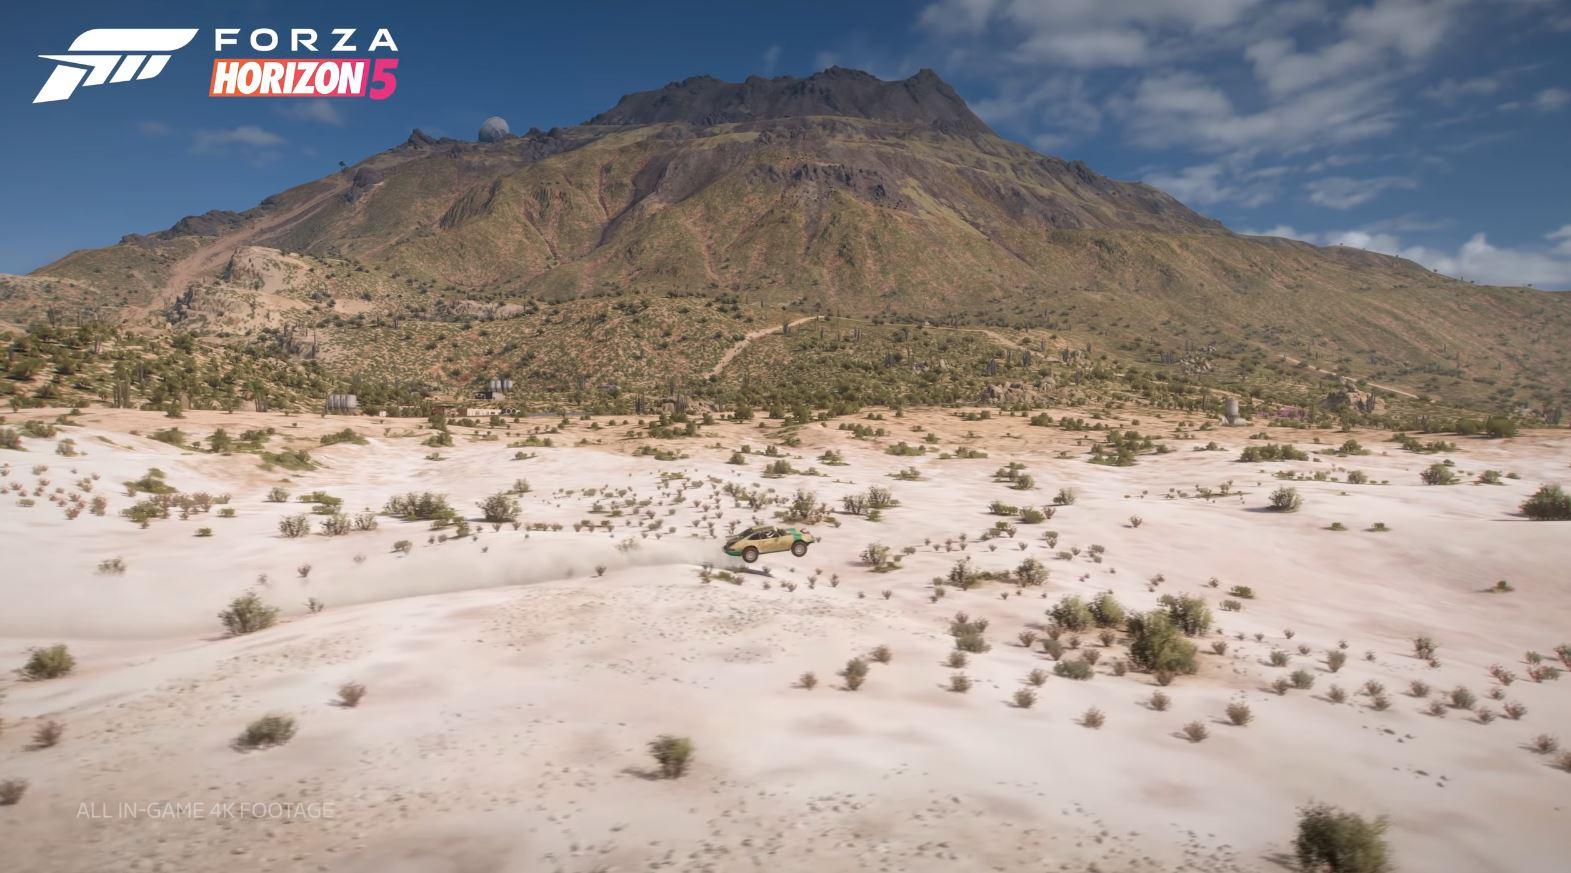 Forza Horizon 5 en desierto.